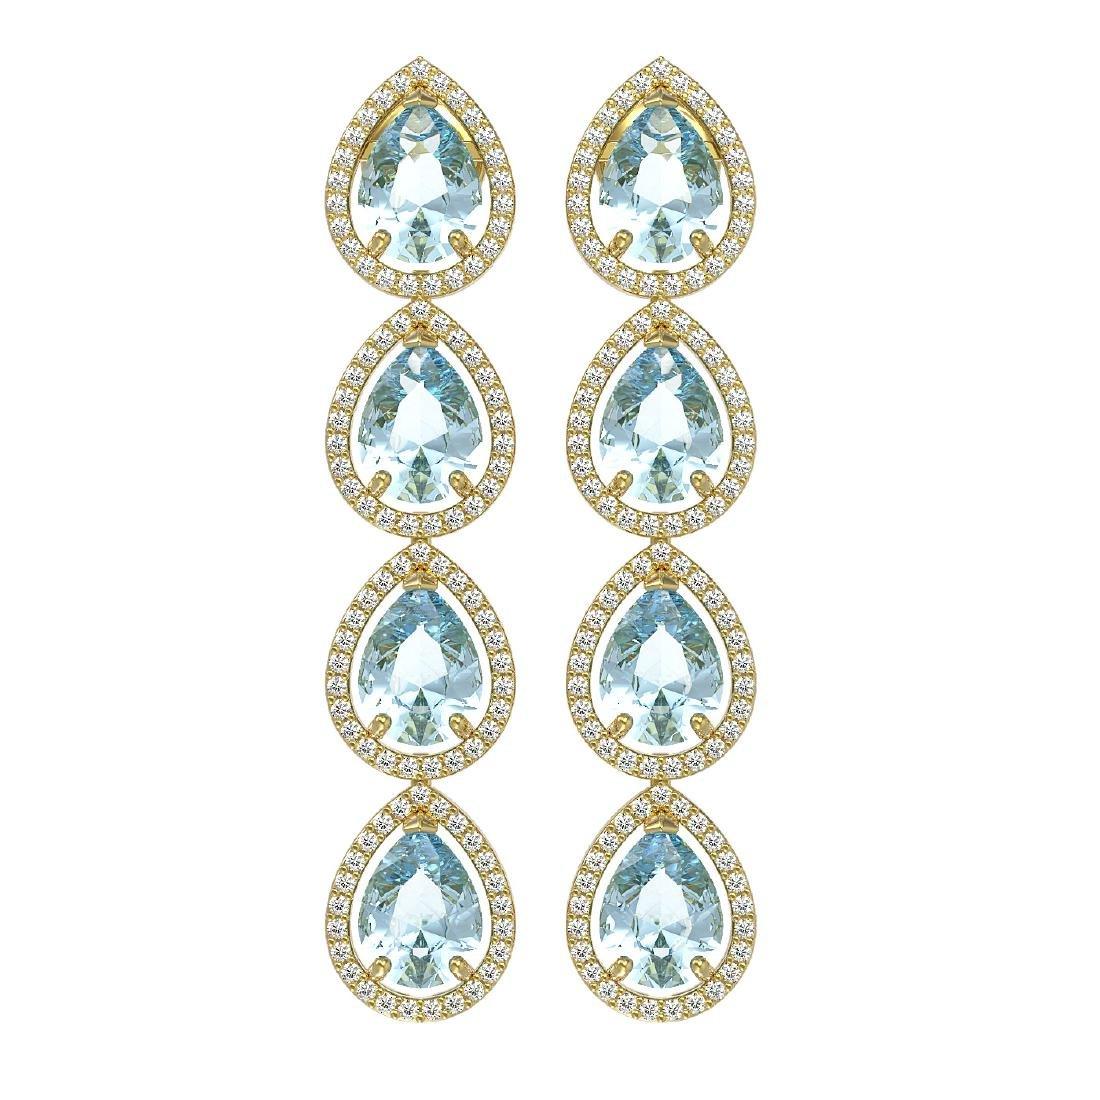 10.56 CTW Aquamarine & Diamond Halo Earrings 10K Yellow